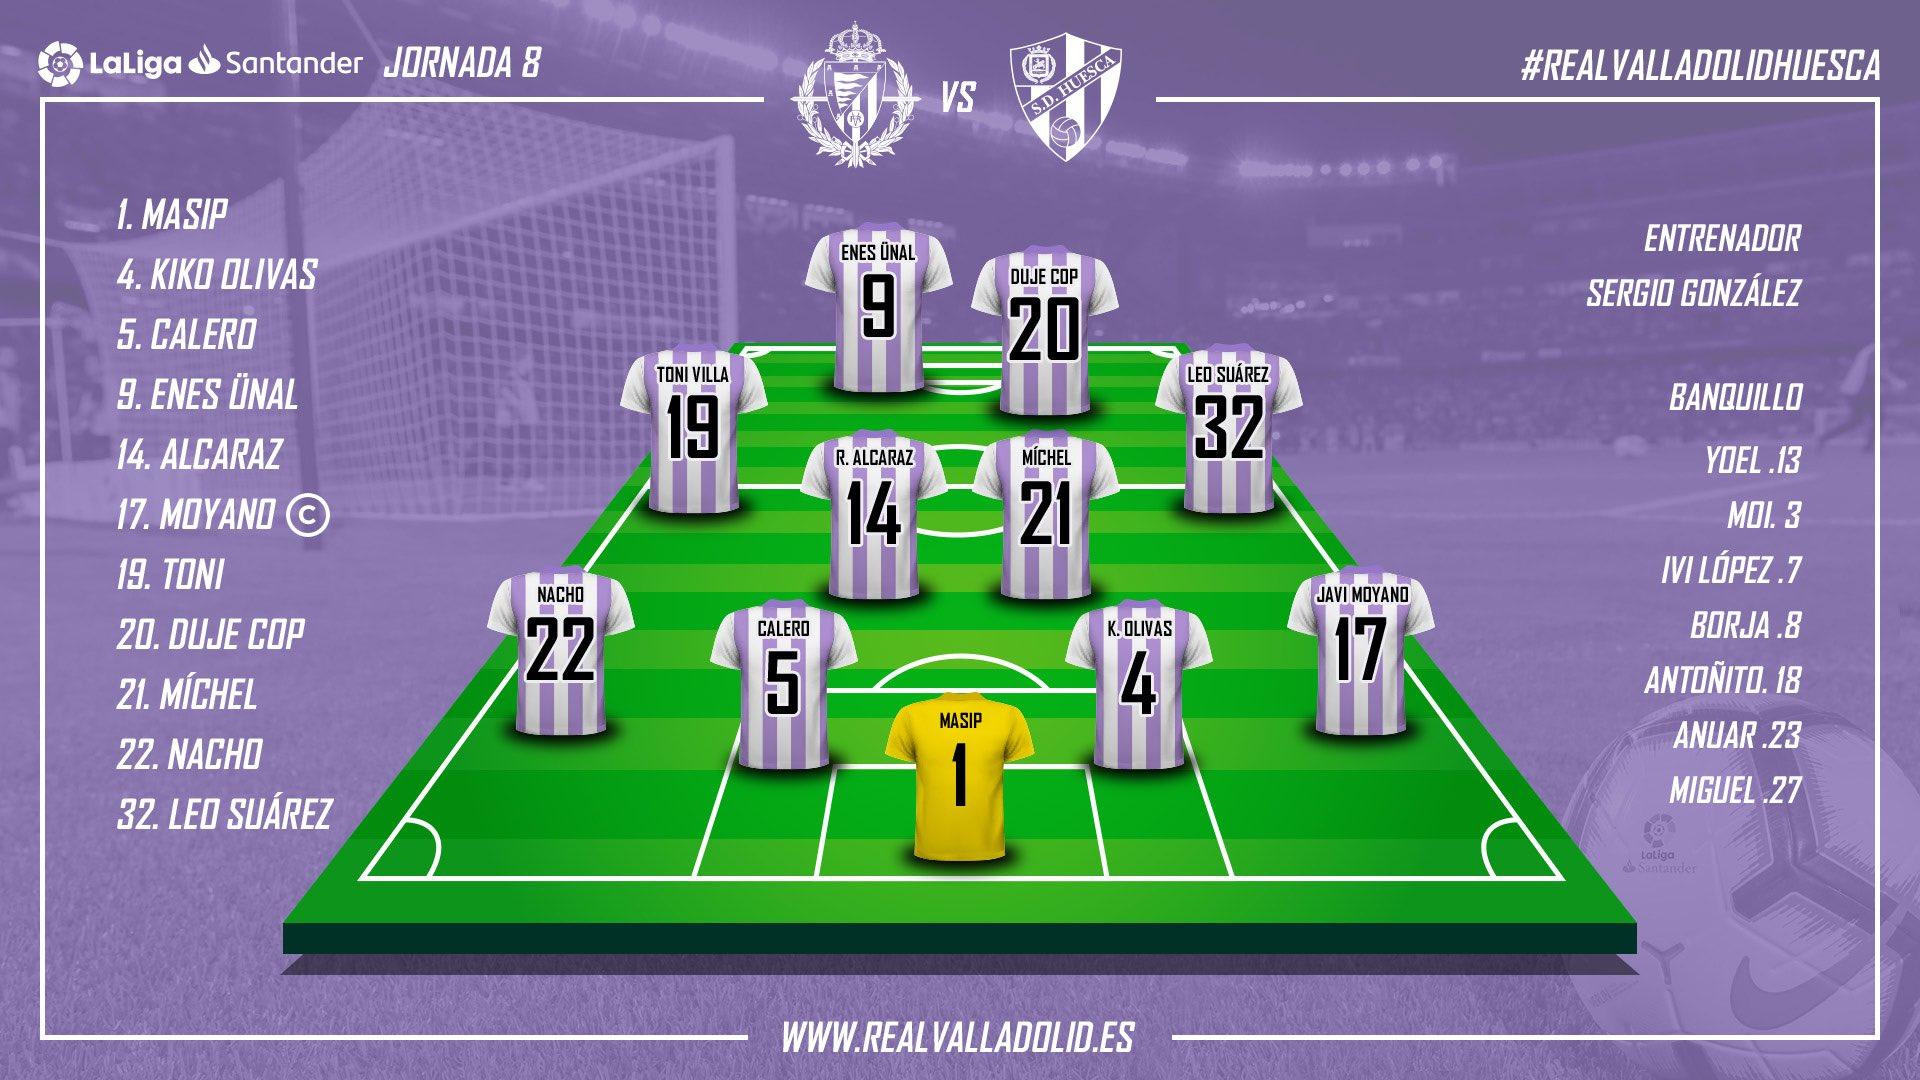 Real Valladolid - S.D. Huesca. Domingo 7 de Octubre. 12:00 IMG_20181007_105954